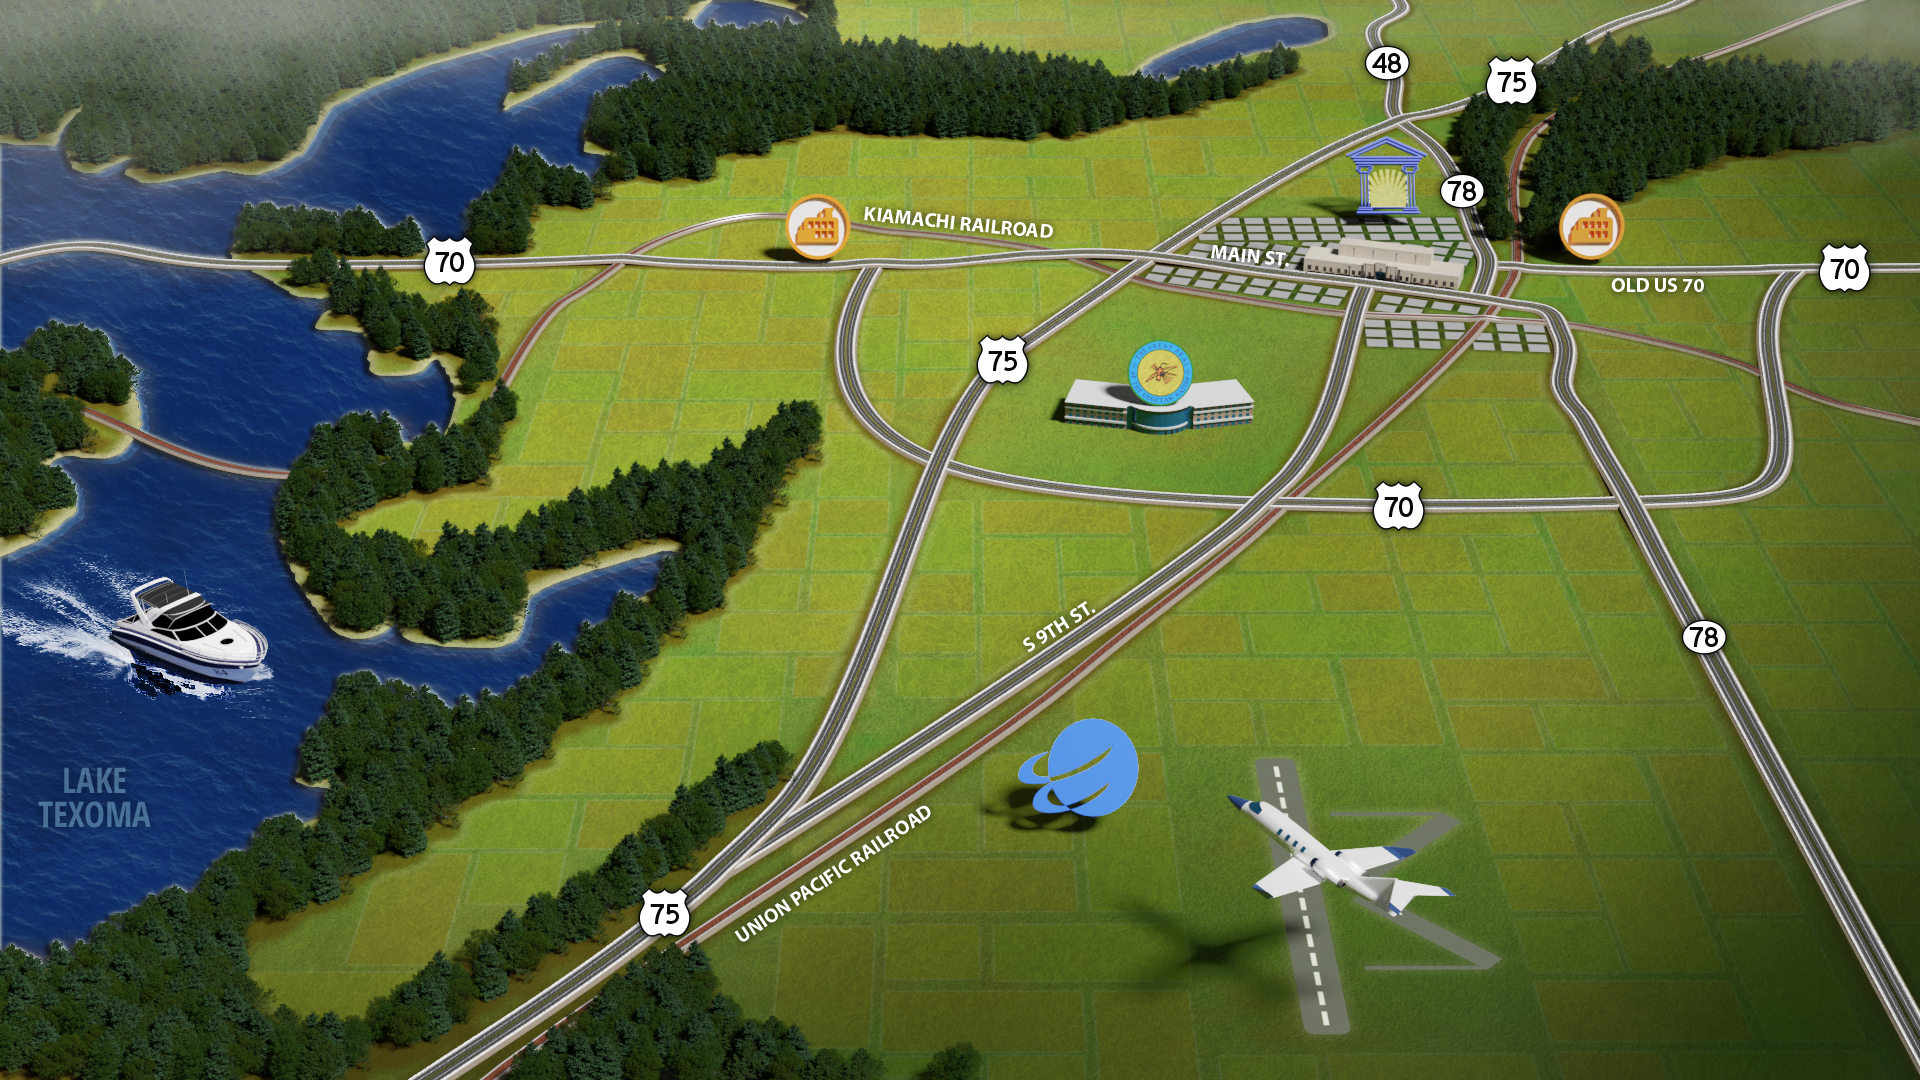 3D base map